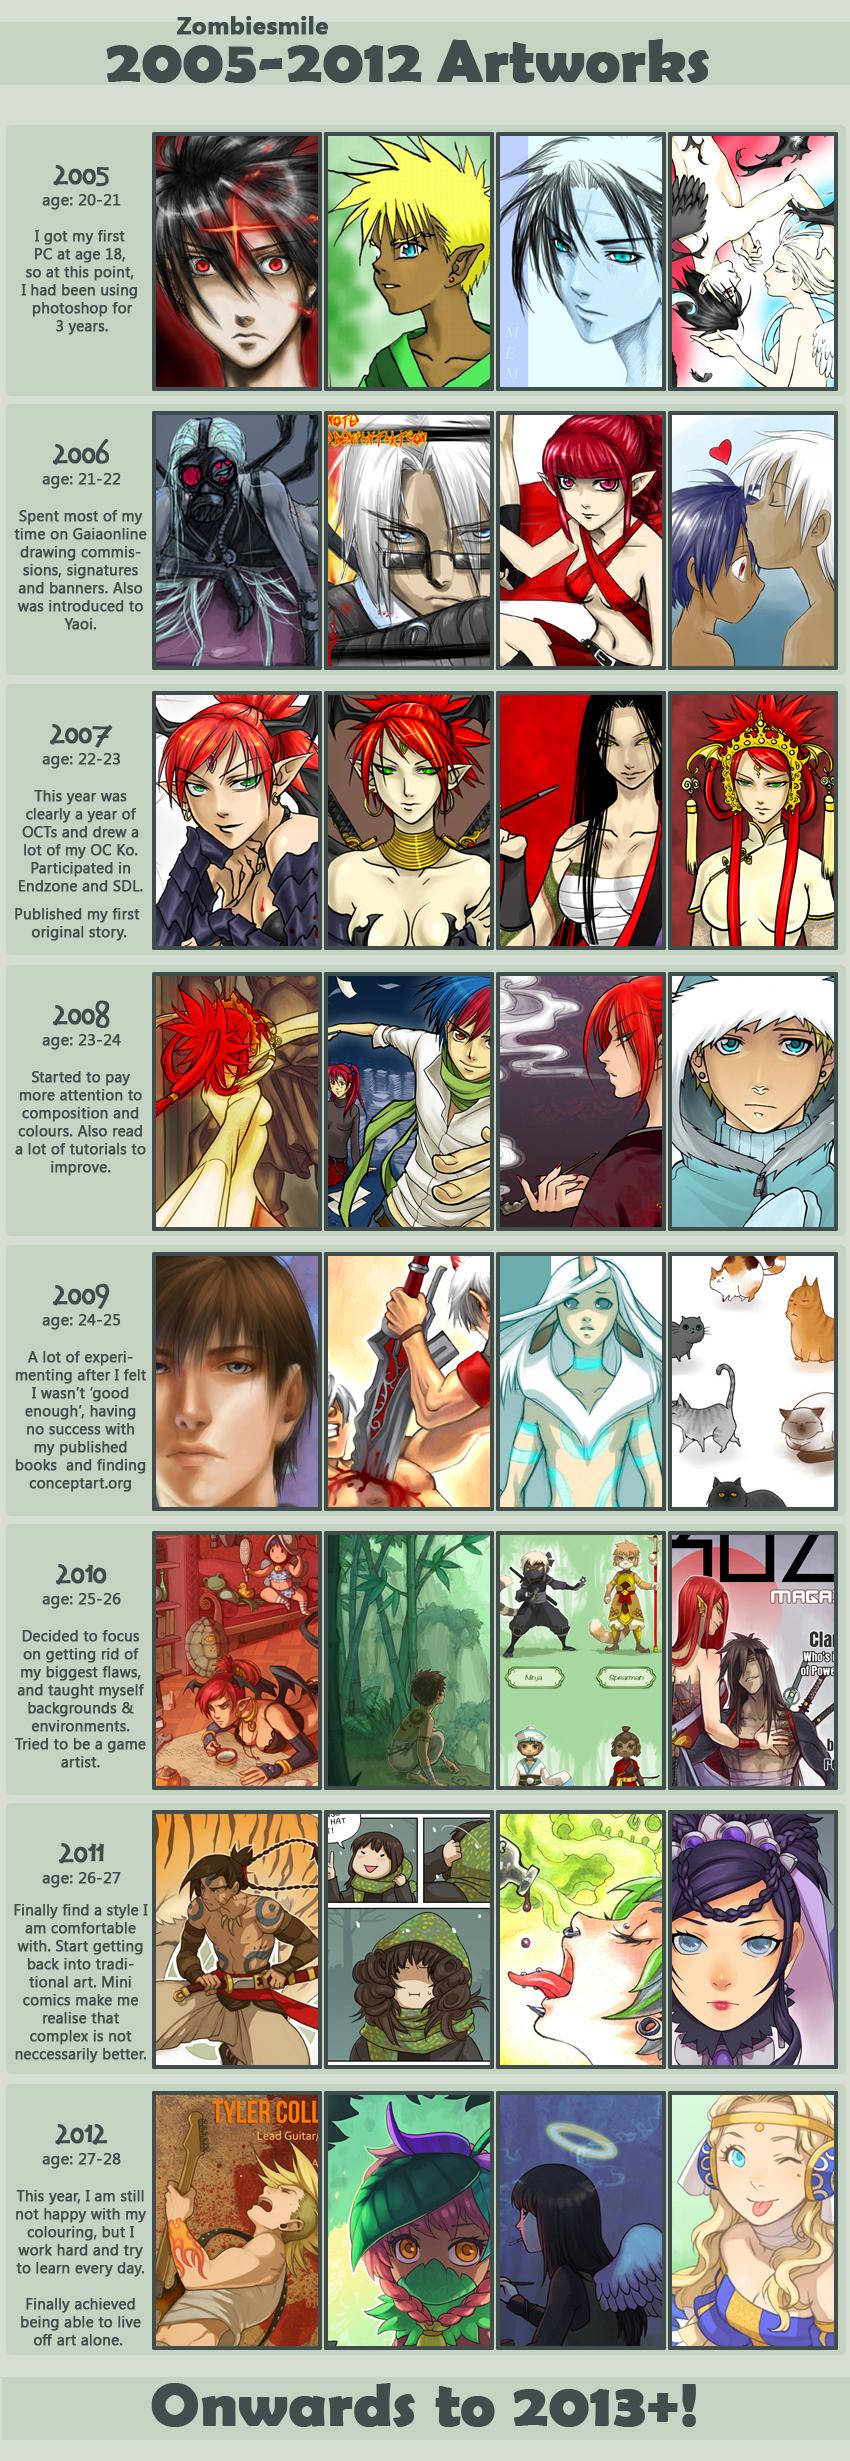 Improvement Meme 2005-2012 by Zombiesmile